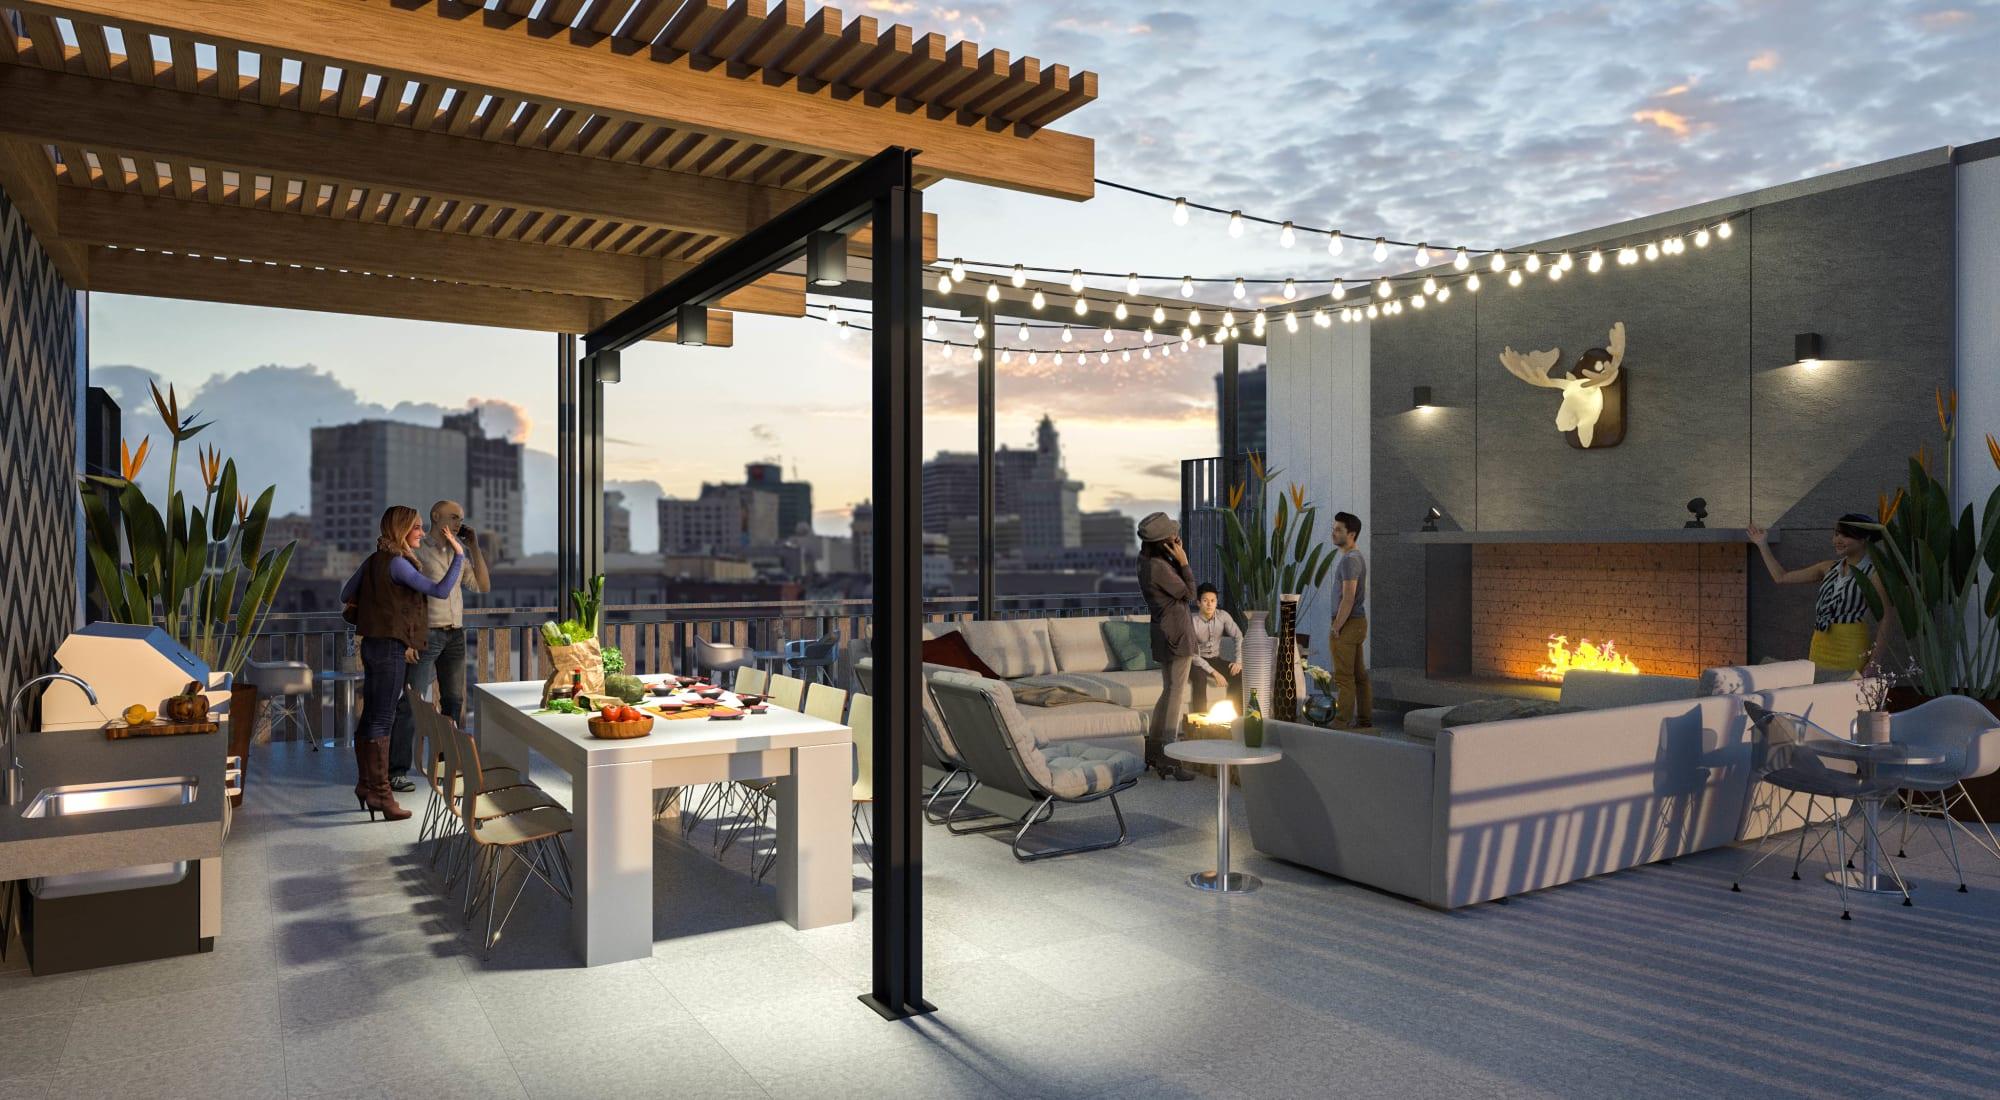 Apartments at The Moran in Oakland, California